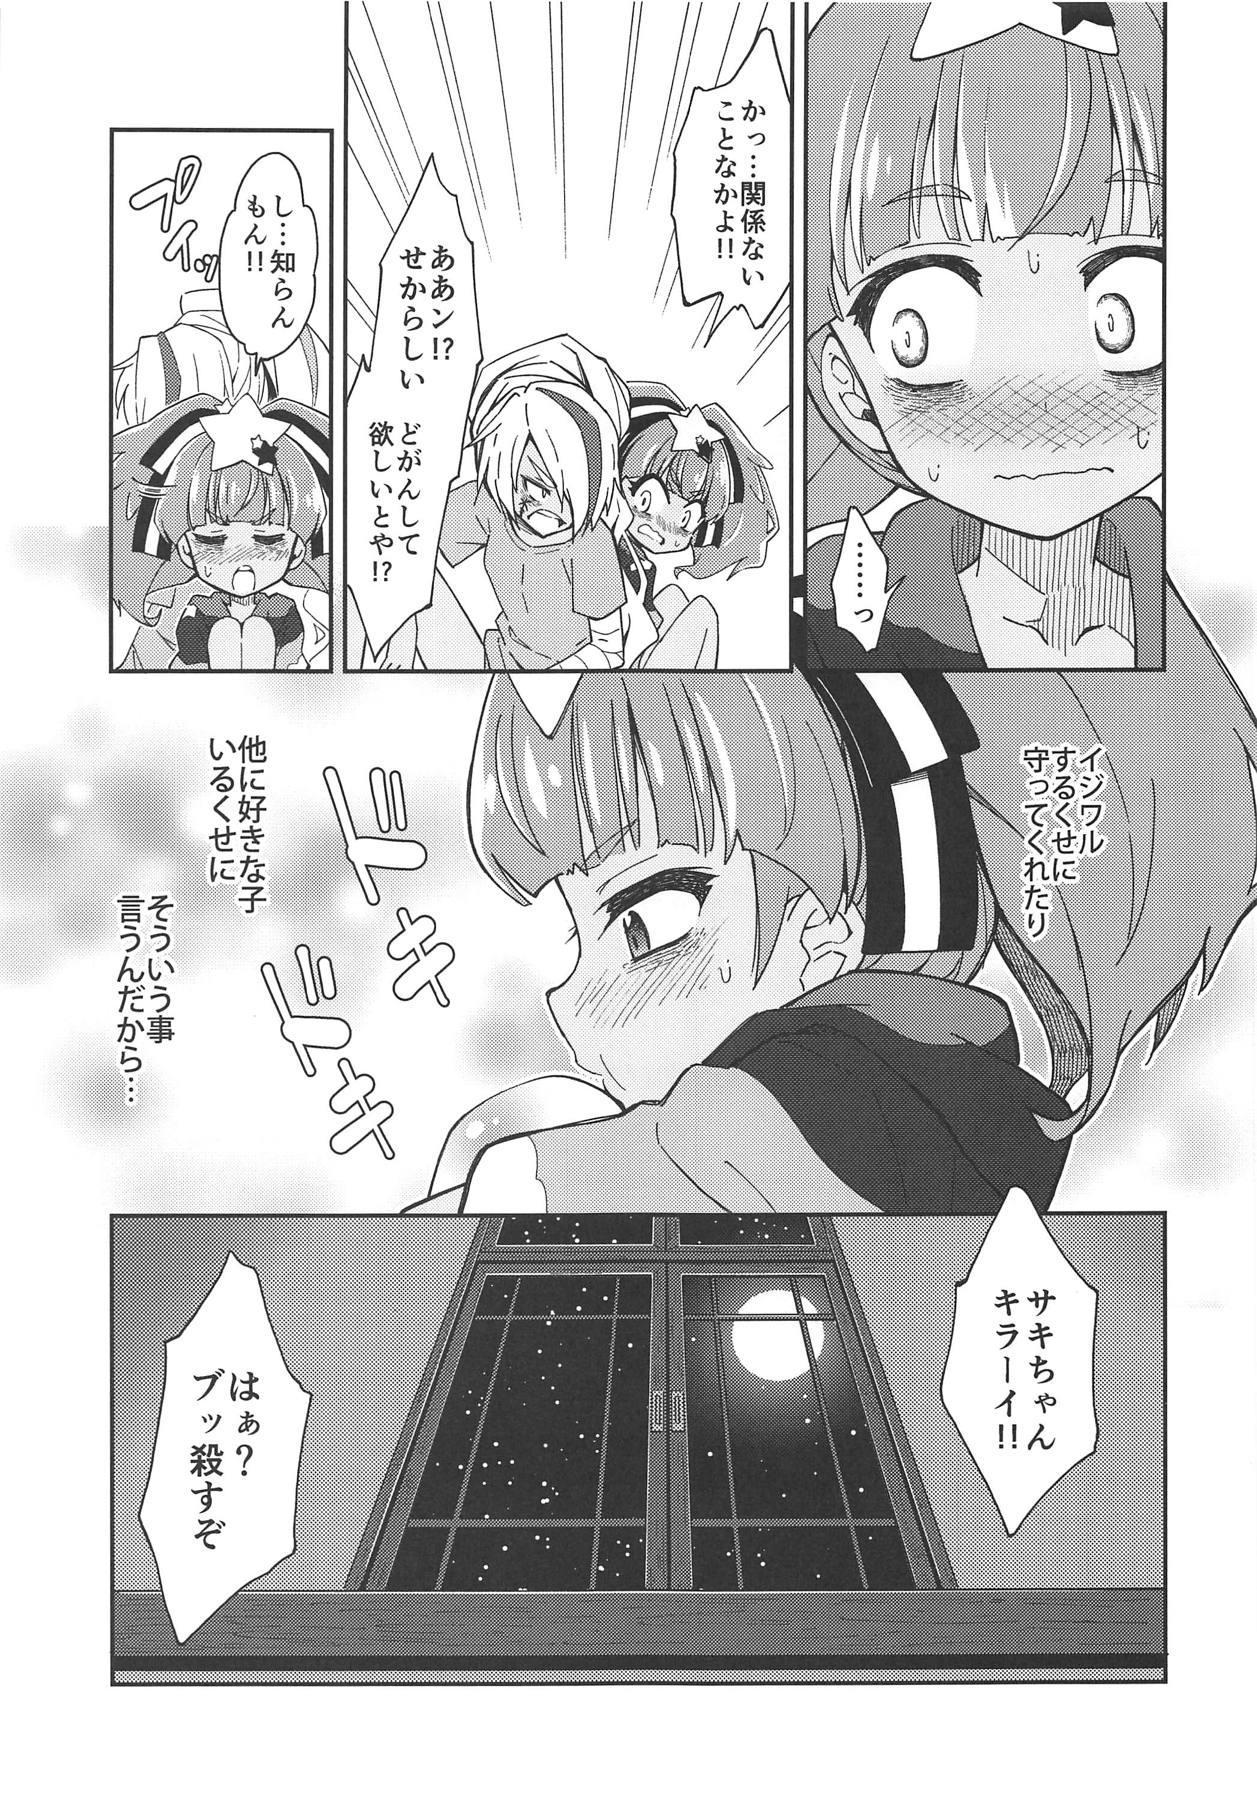 Lovely Girls' Lily Vol. 18 14